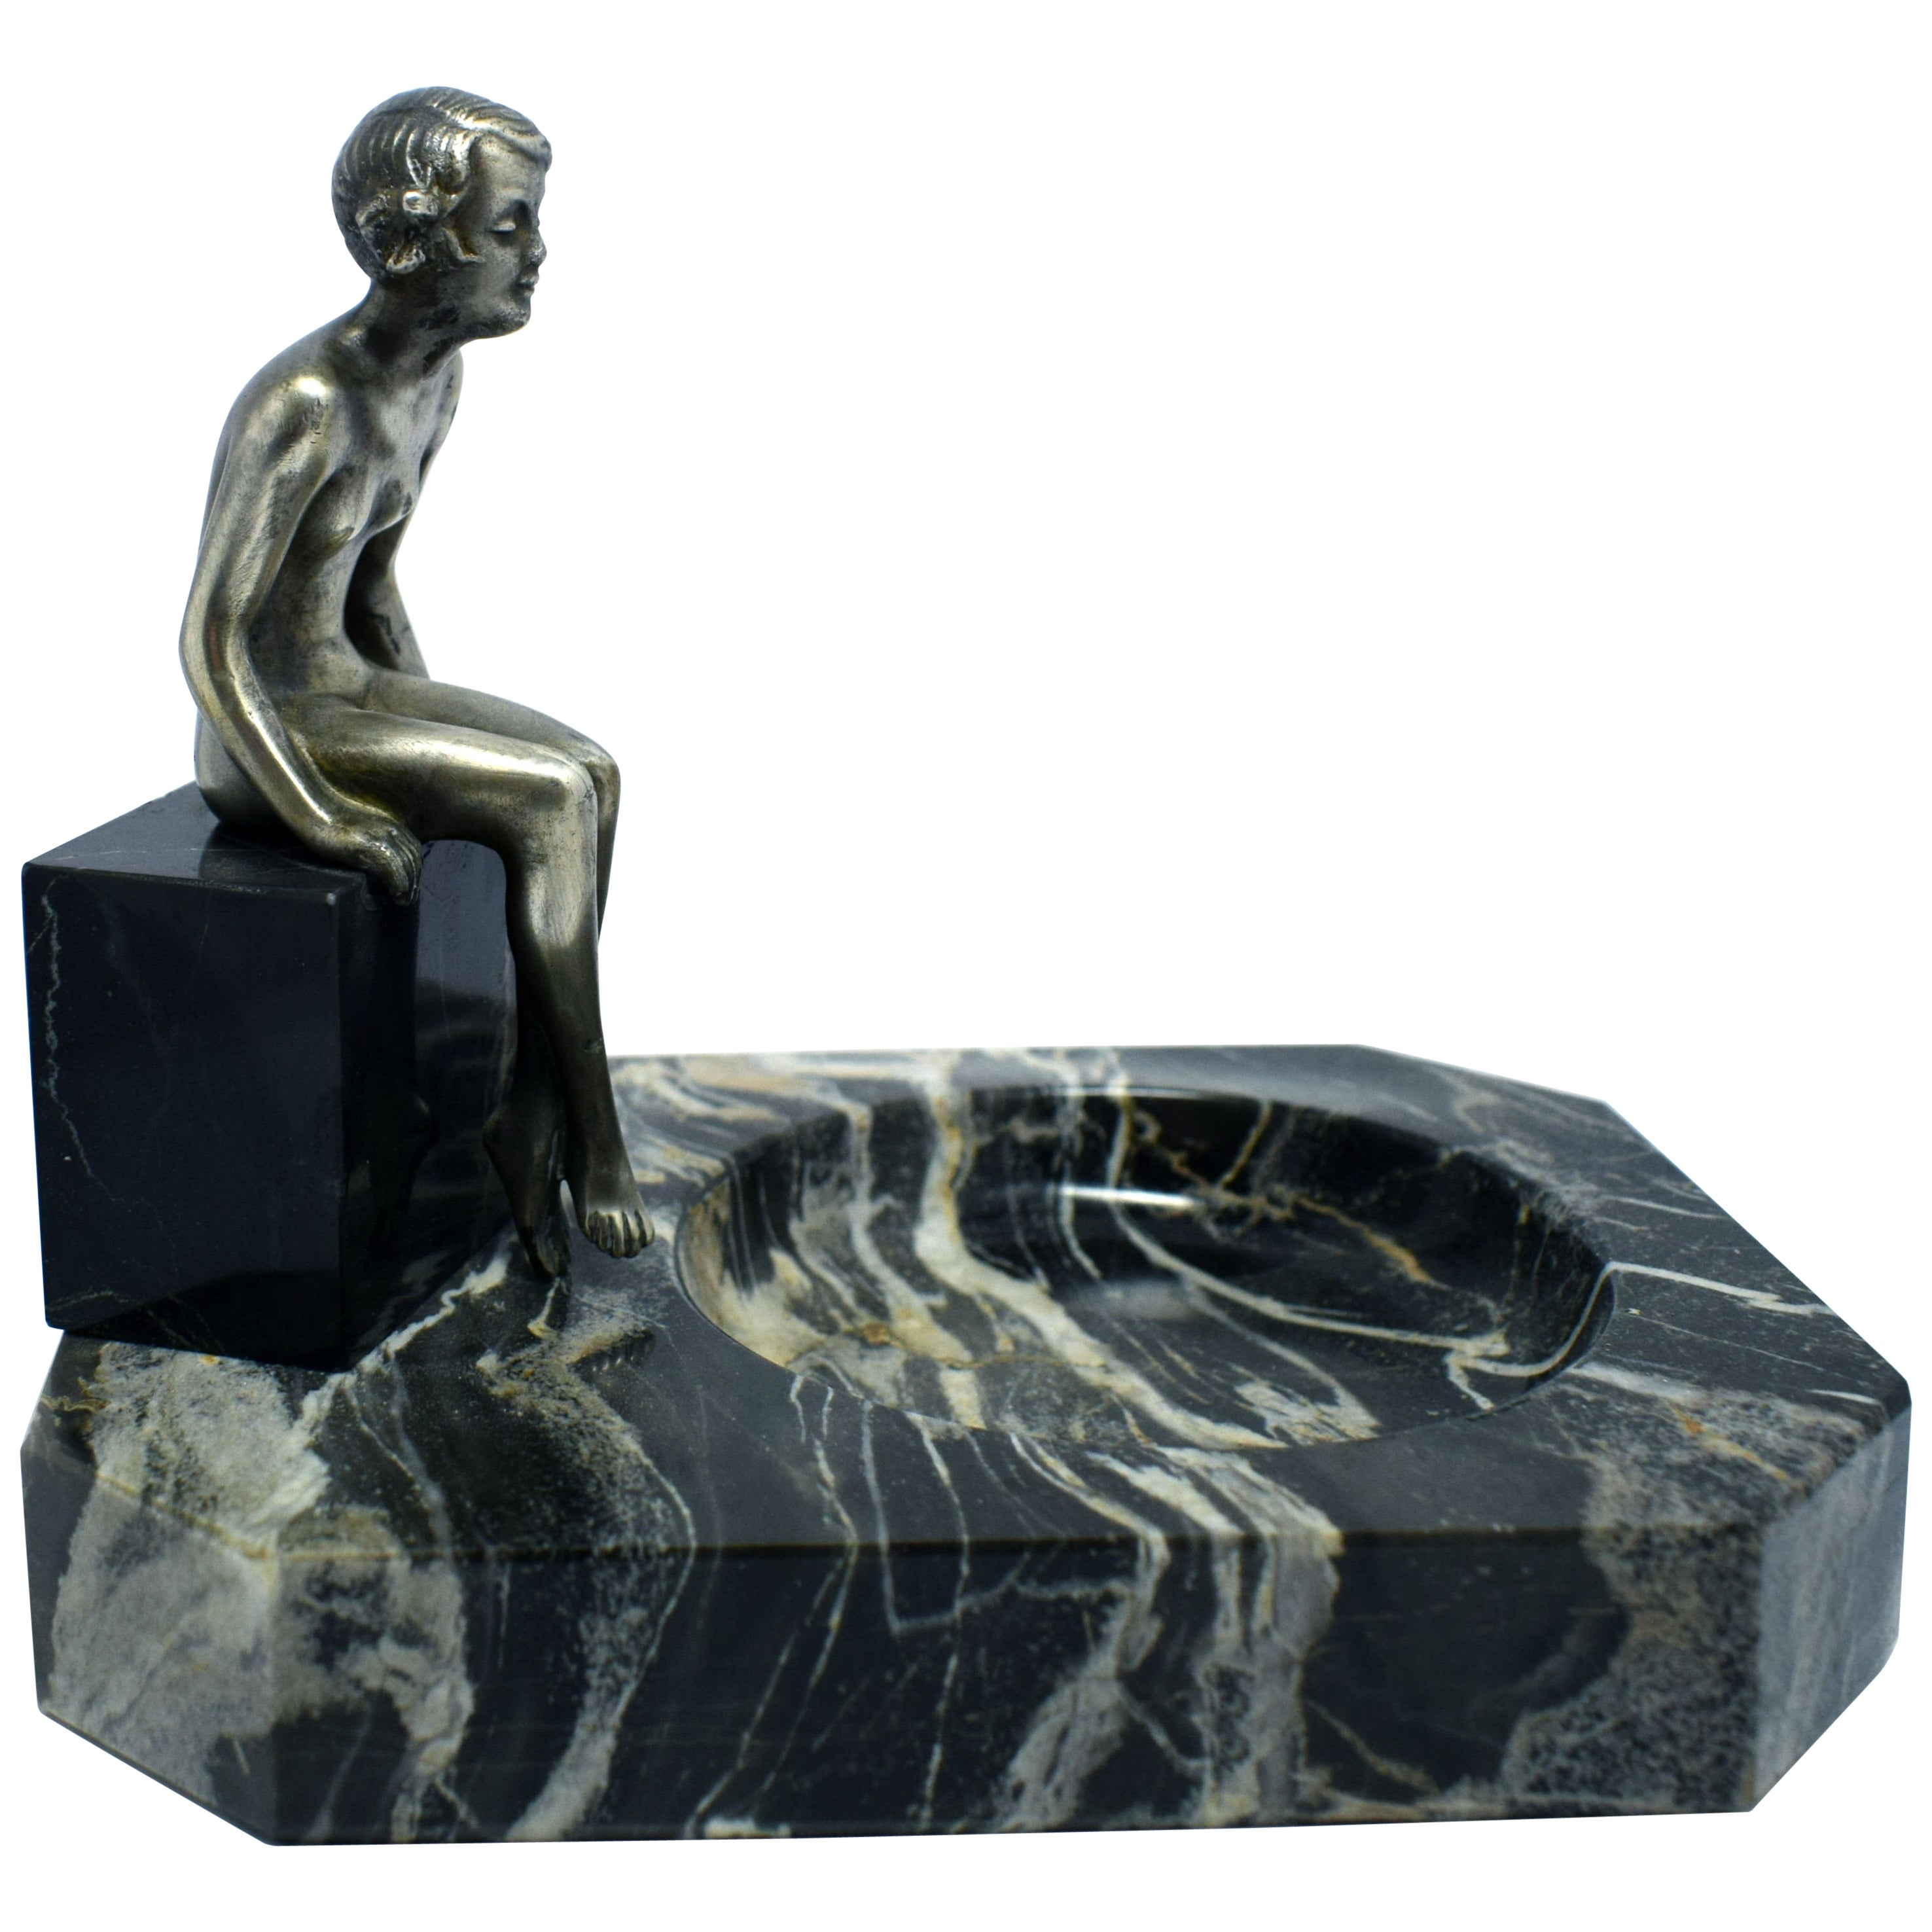 Art Deco Bronze Nude Figure, Josef Lorenzl, Vienna 1930